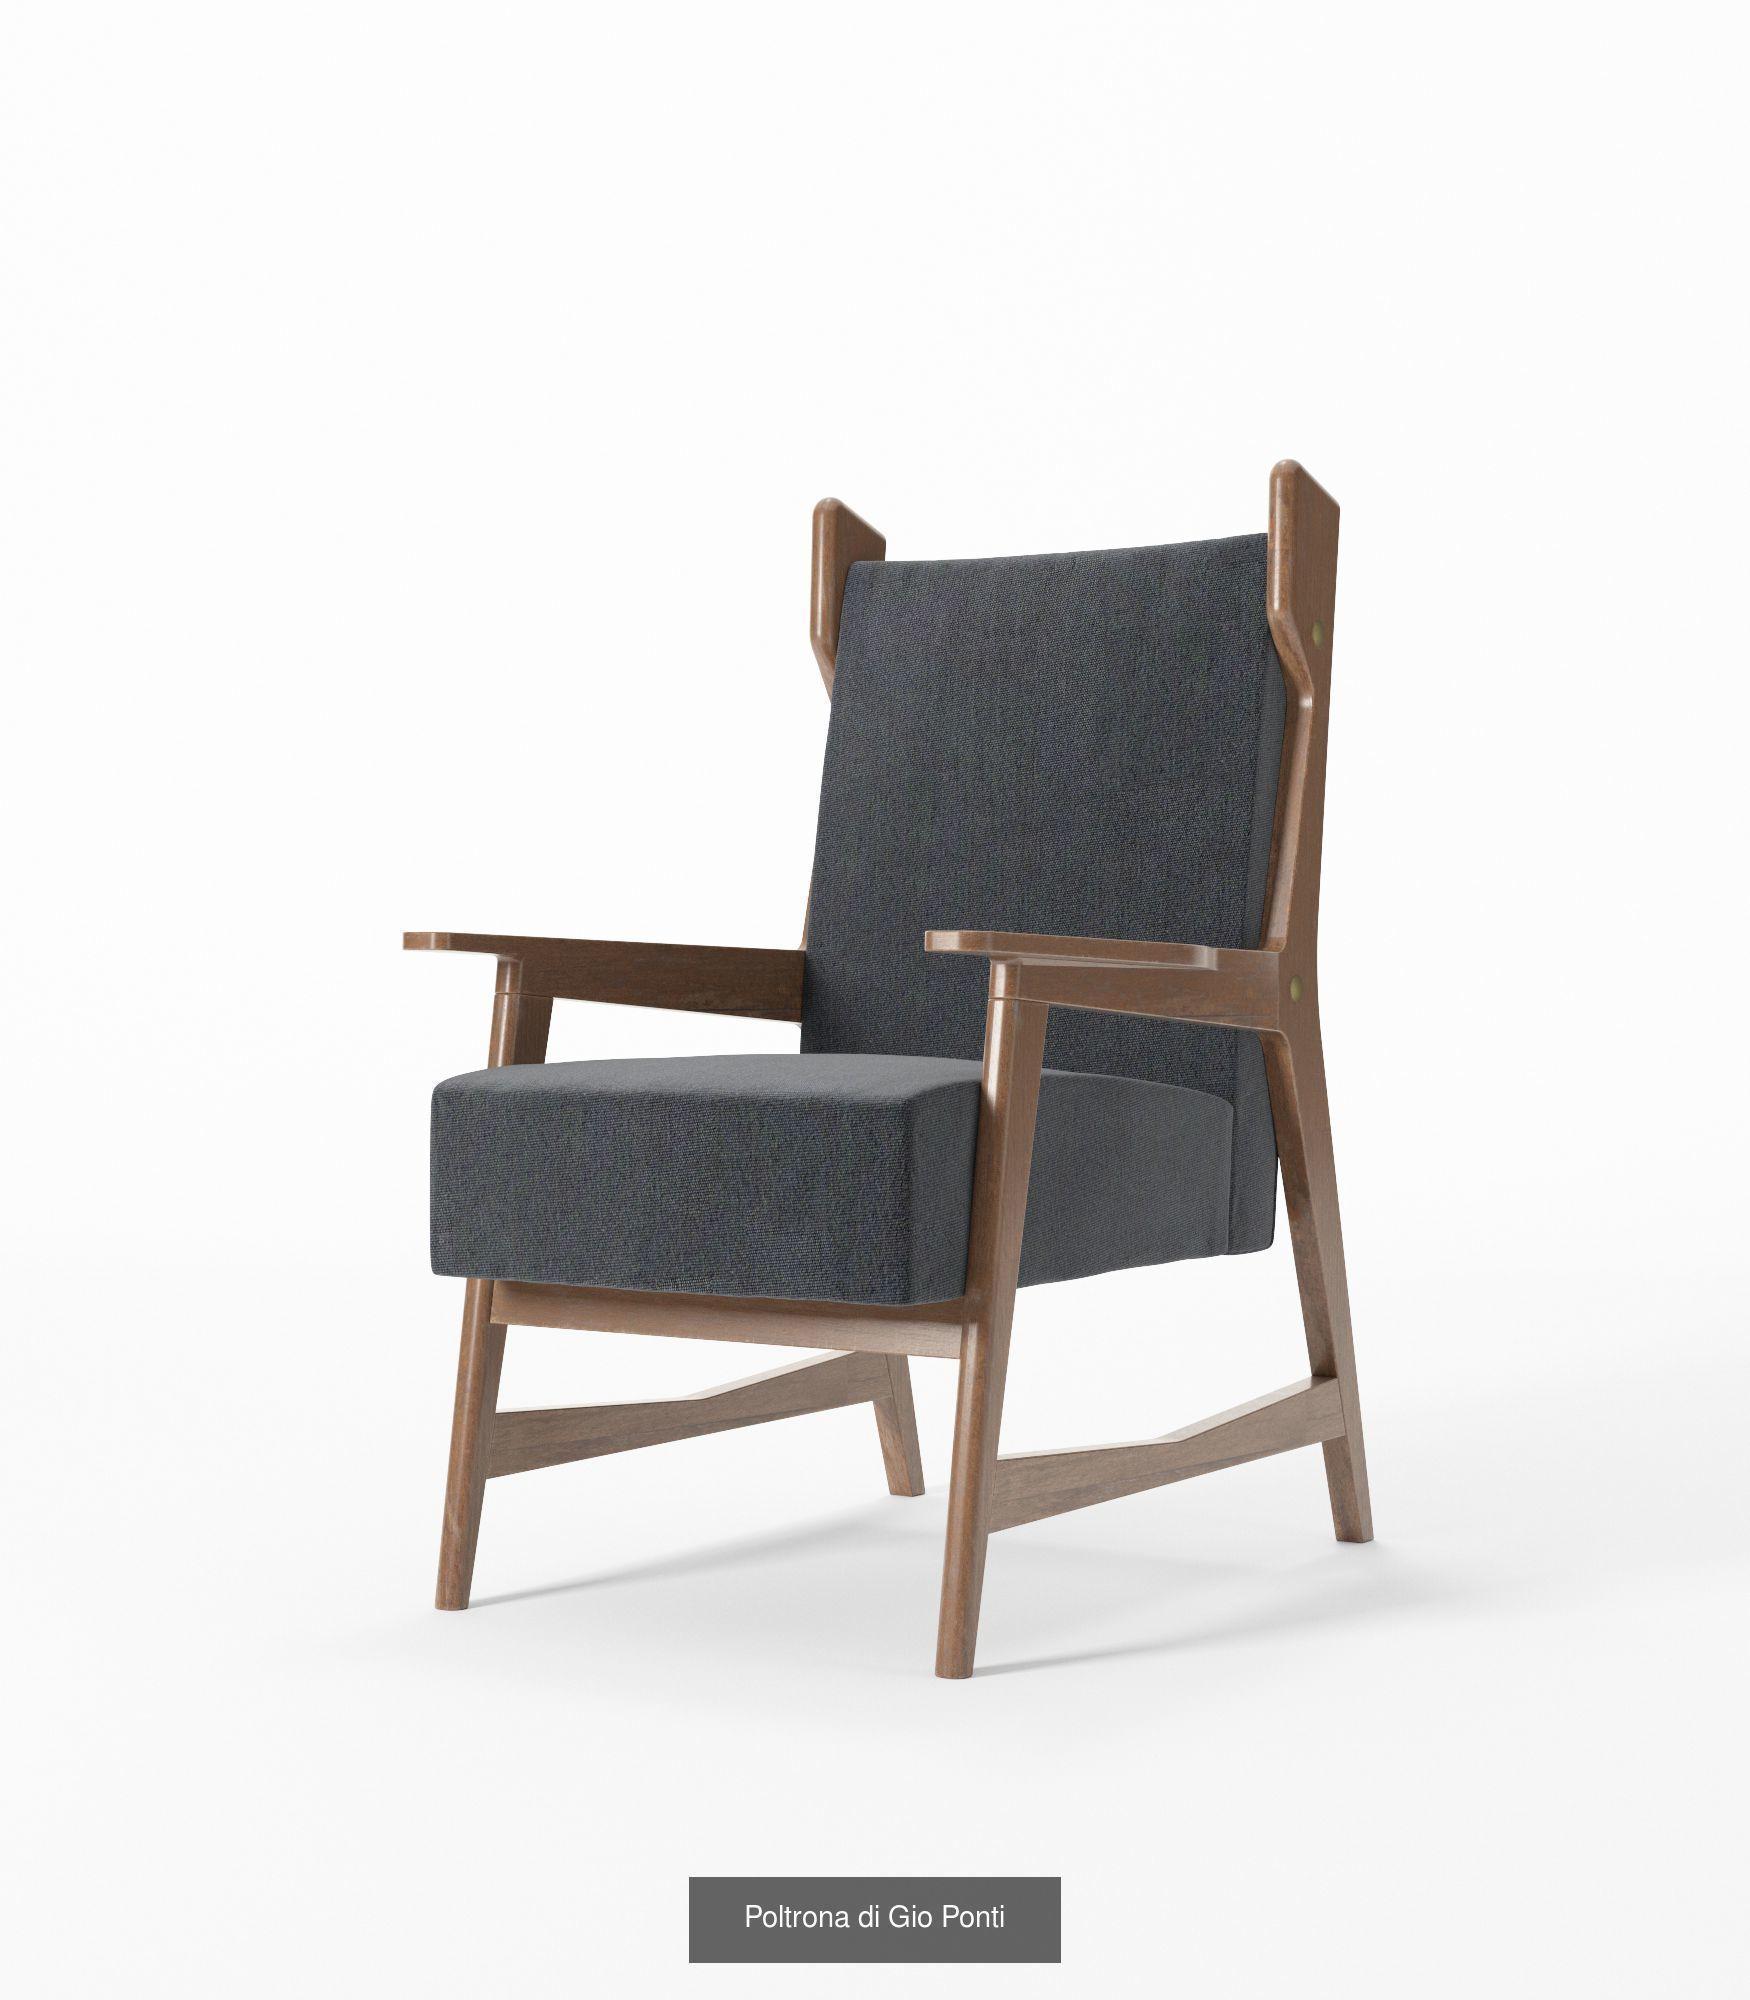 Mid century modern seating 3d model obj mtl 3ds fbx c4d dxf 8